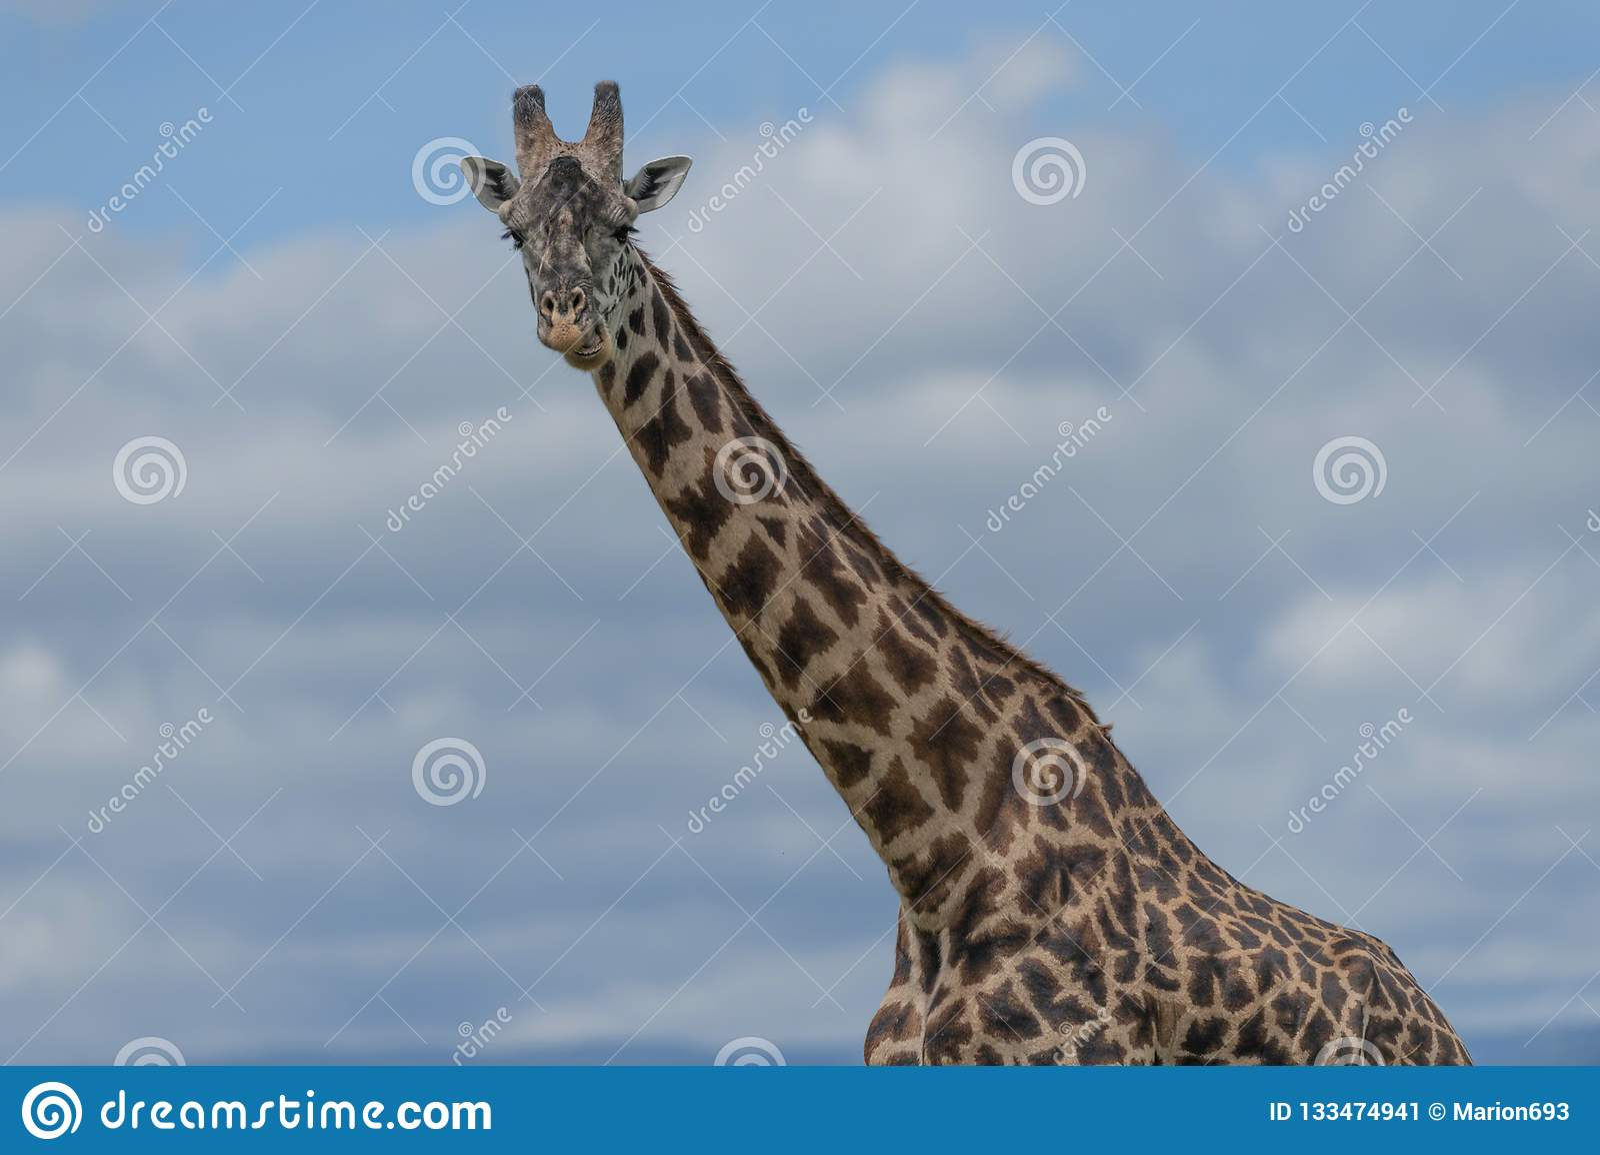 Giraffe looking at camera from right